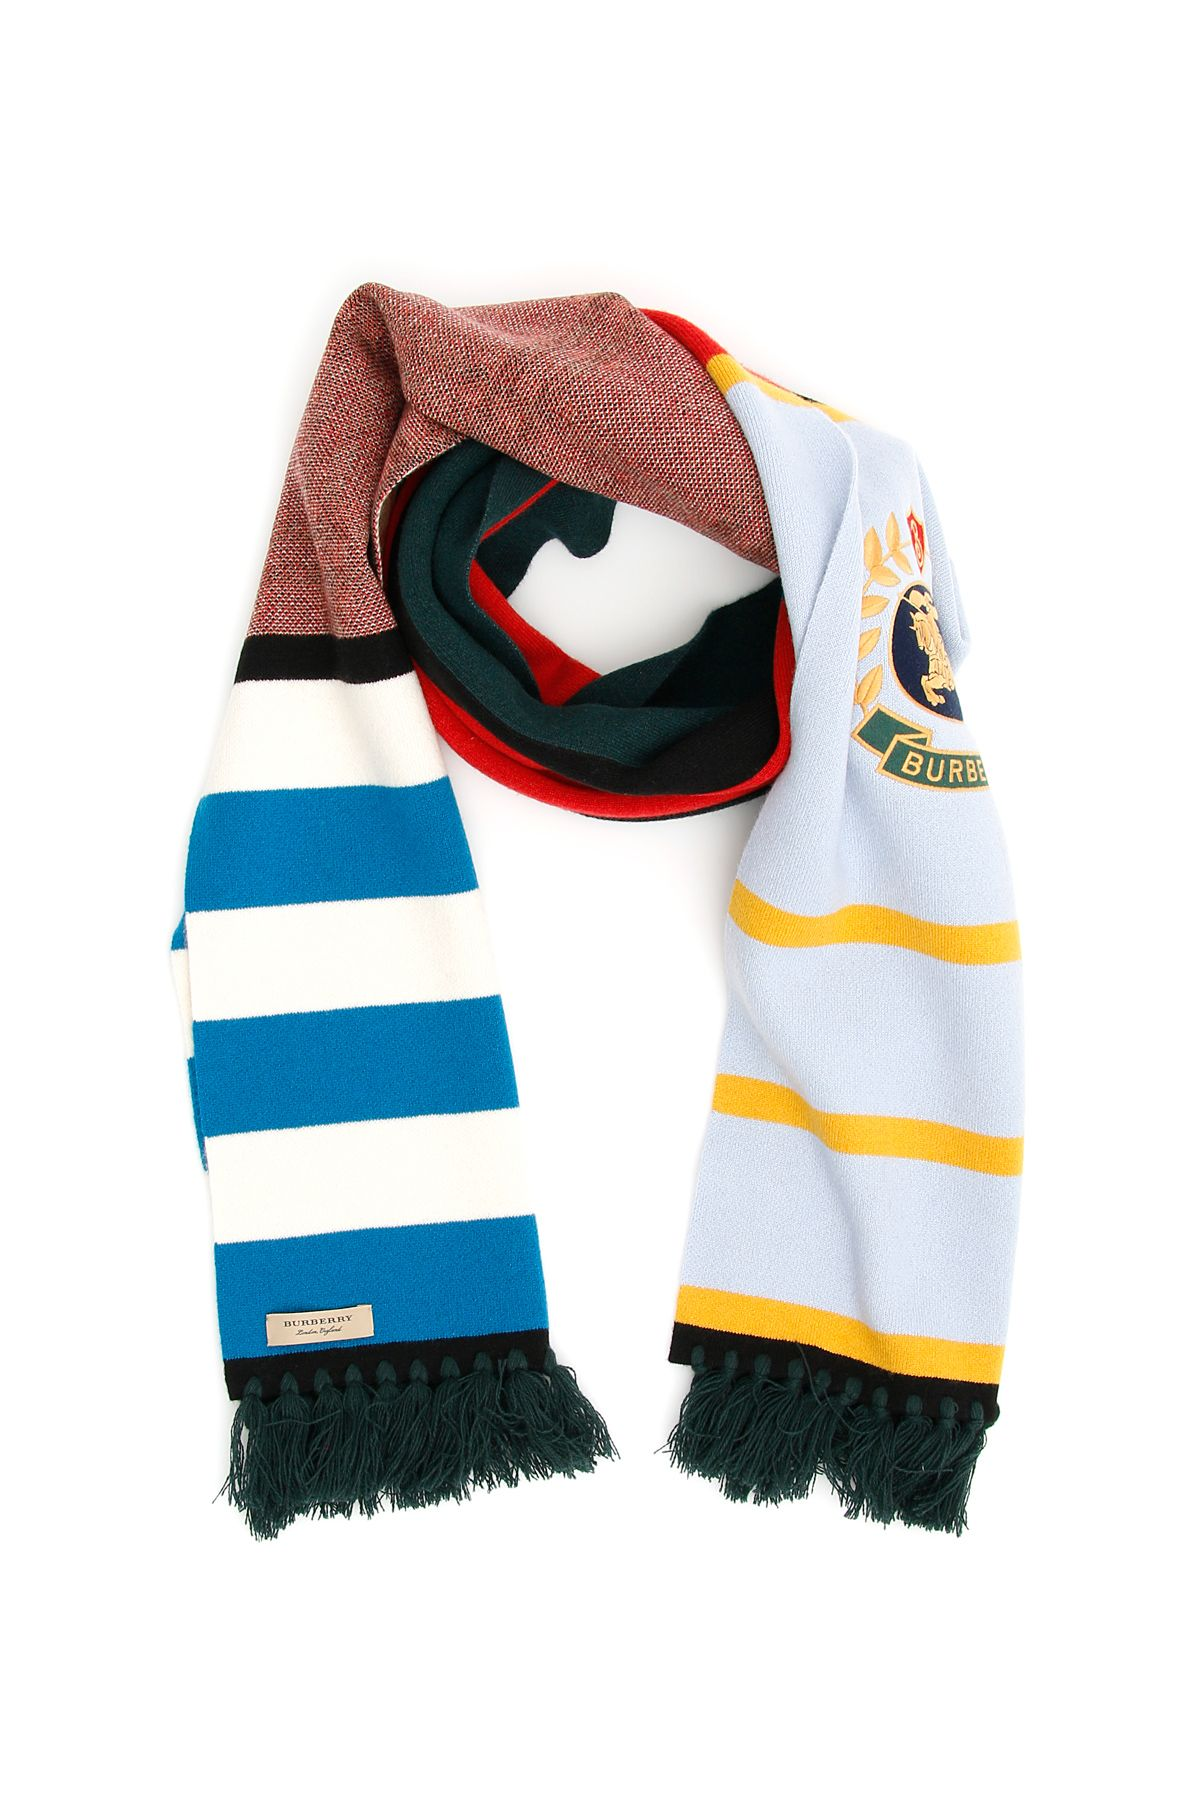 Burberry Crest Football Scarf